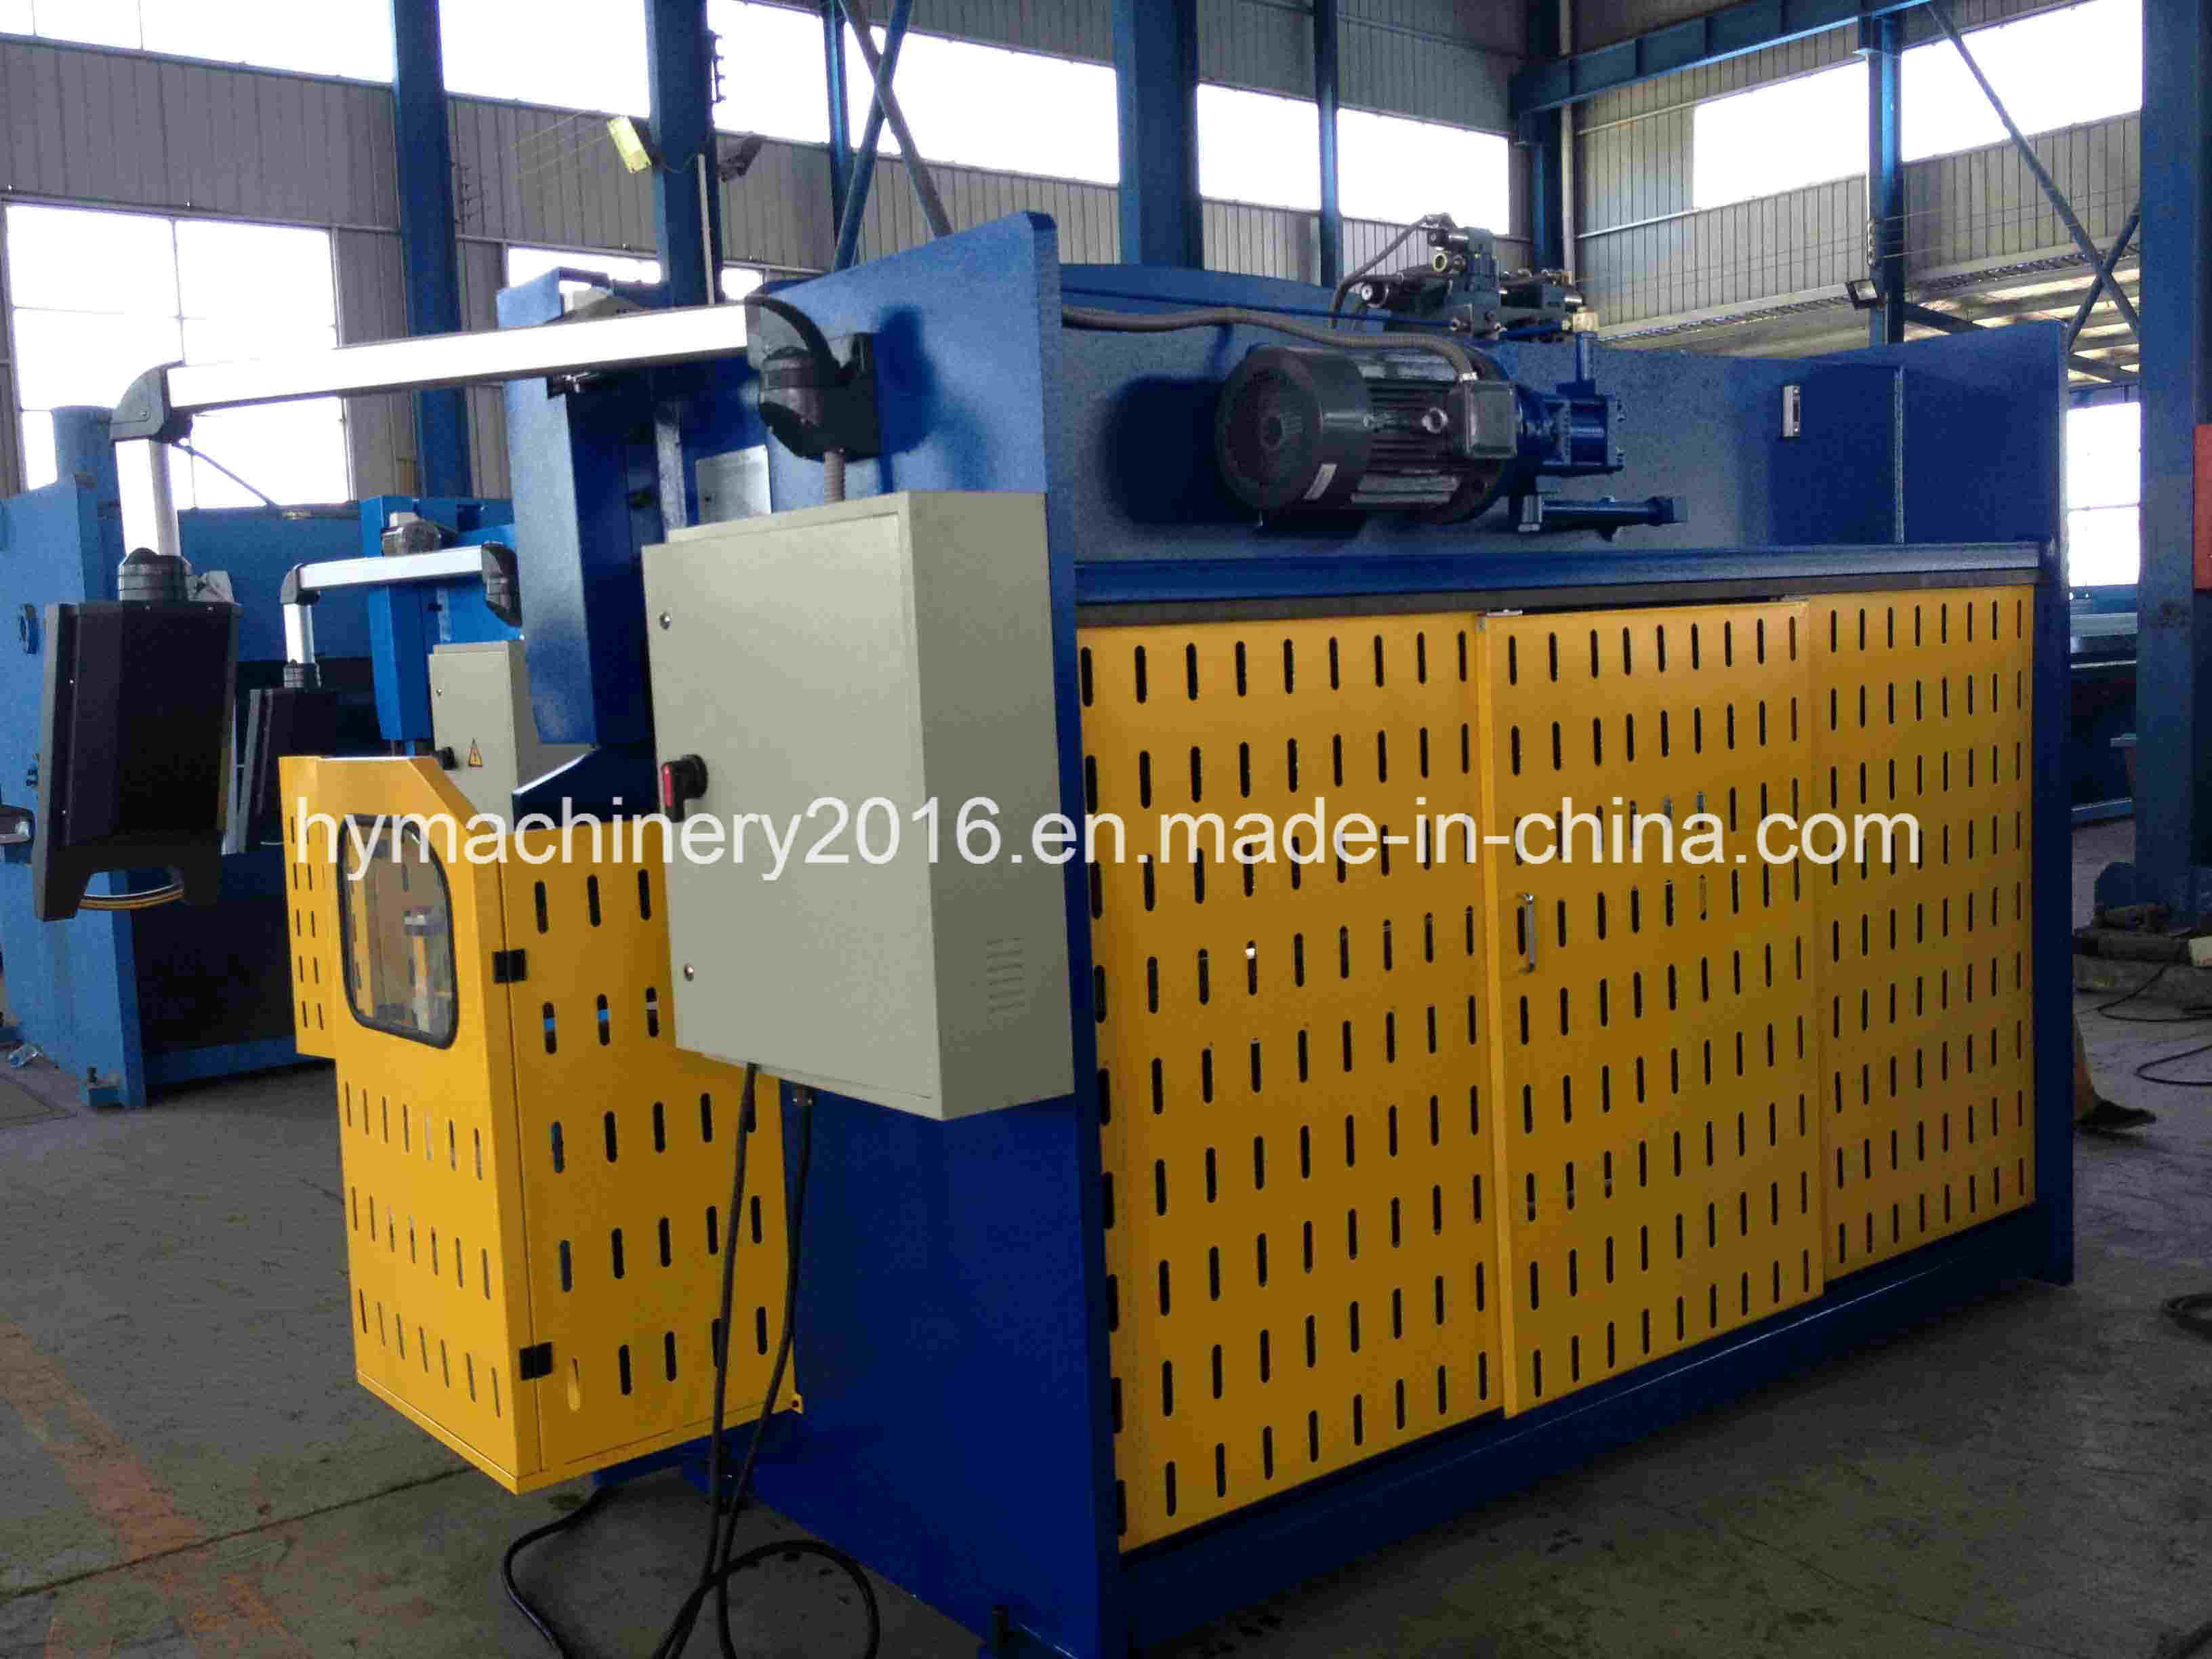 WC67Y-100X4000 hydraulic press brake bending machine